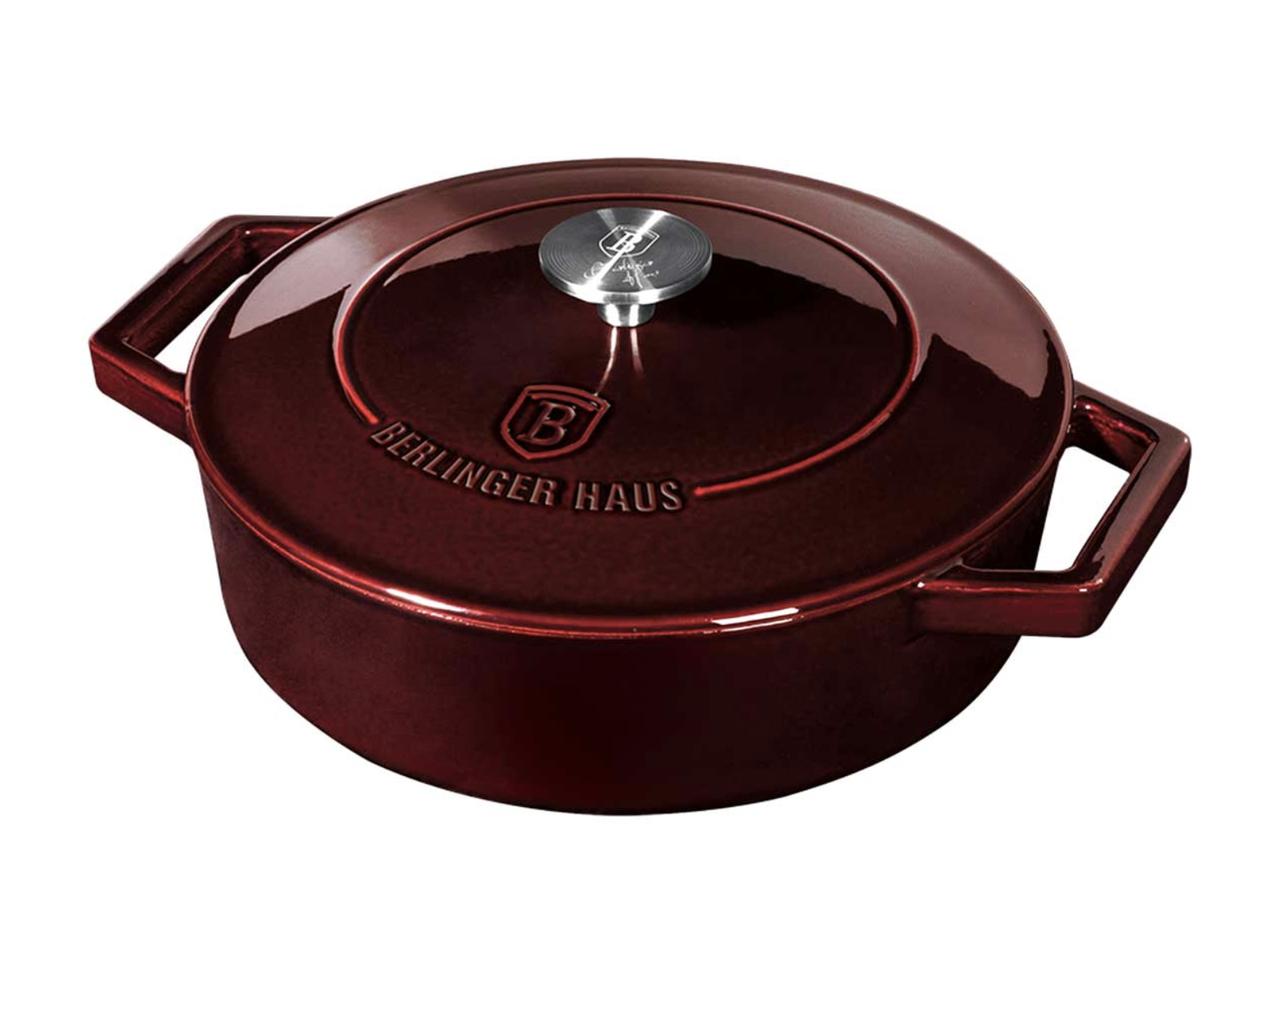 Чугунная кастрюля с крышкой Berlinger Haus Metallic Line Burgundy Edition 2.5 л